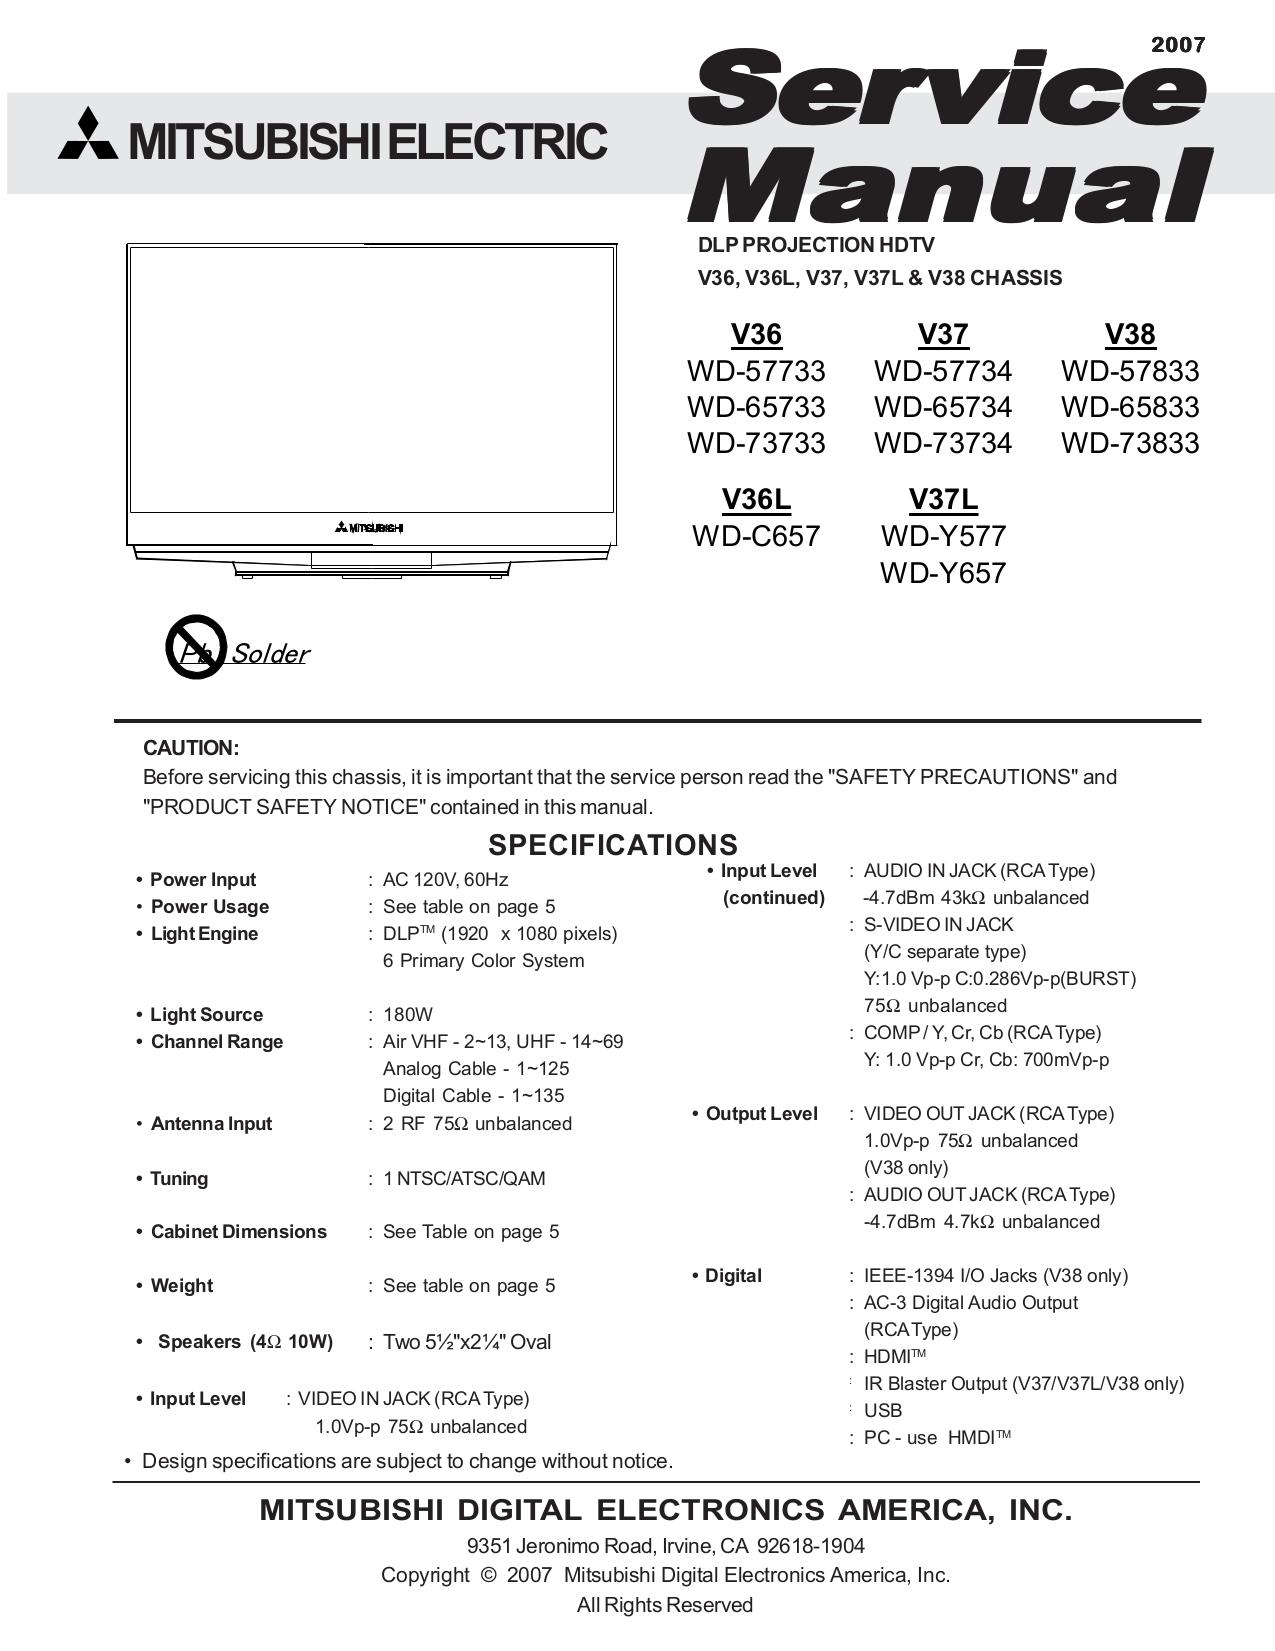 pdf for Mitsubishi TV WD-Y577 manual